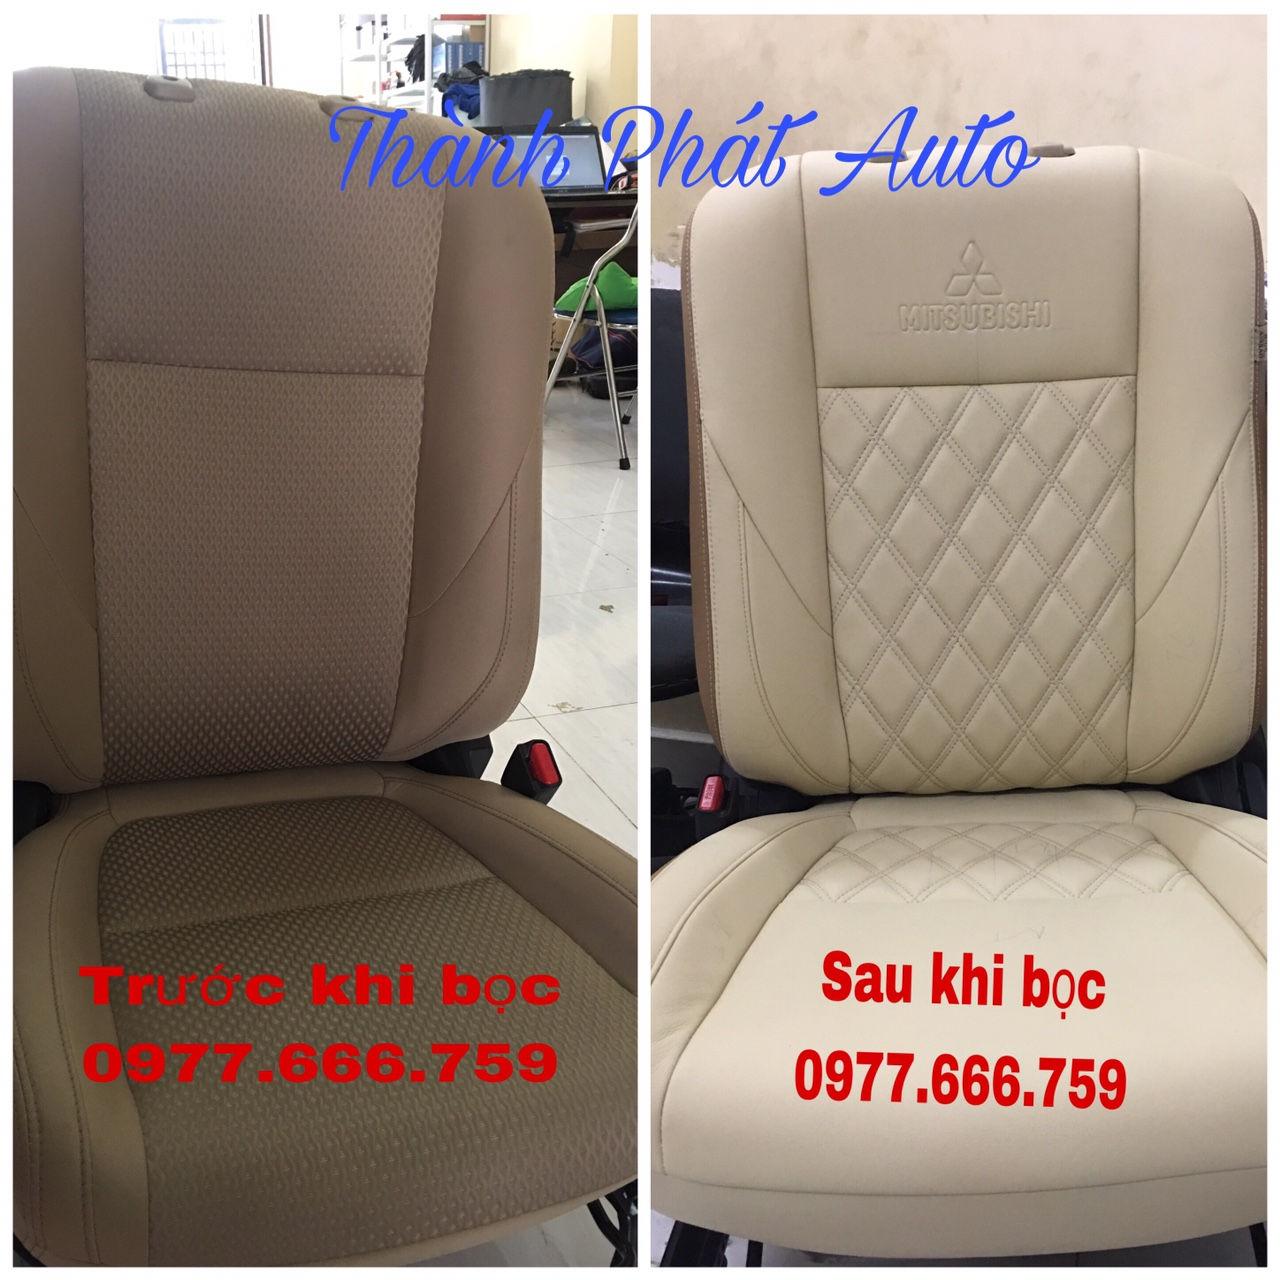 May bọc ghế da cho xe mitsubishi Attrage tại tphcm